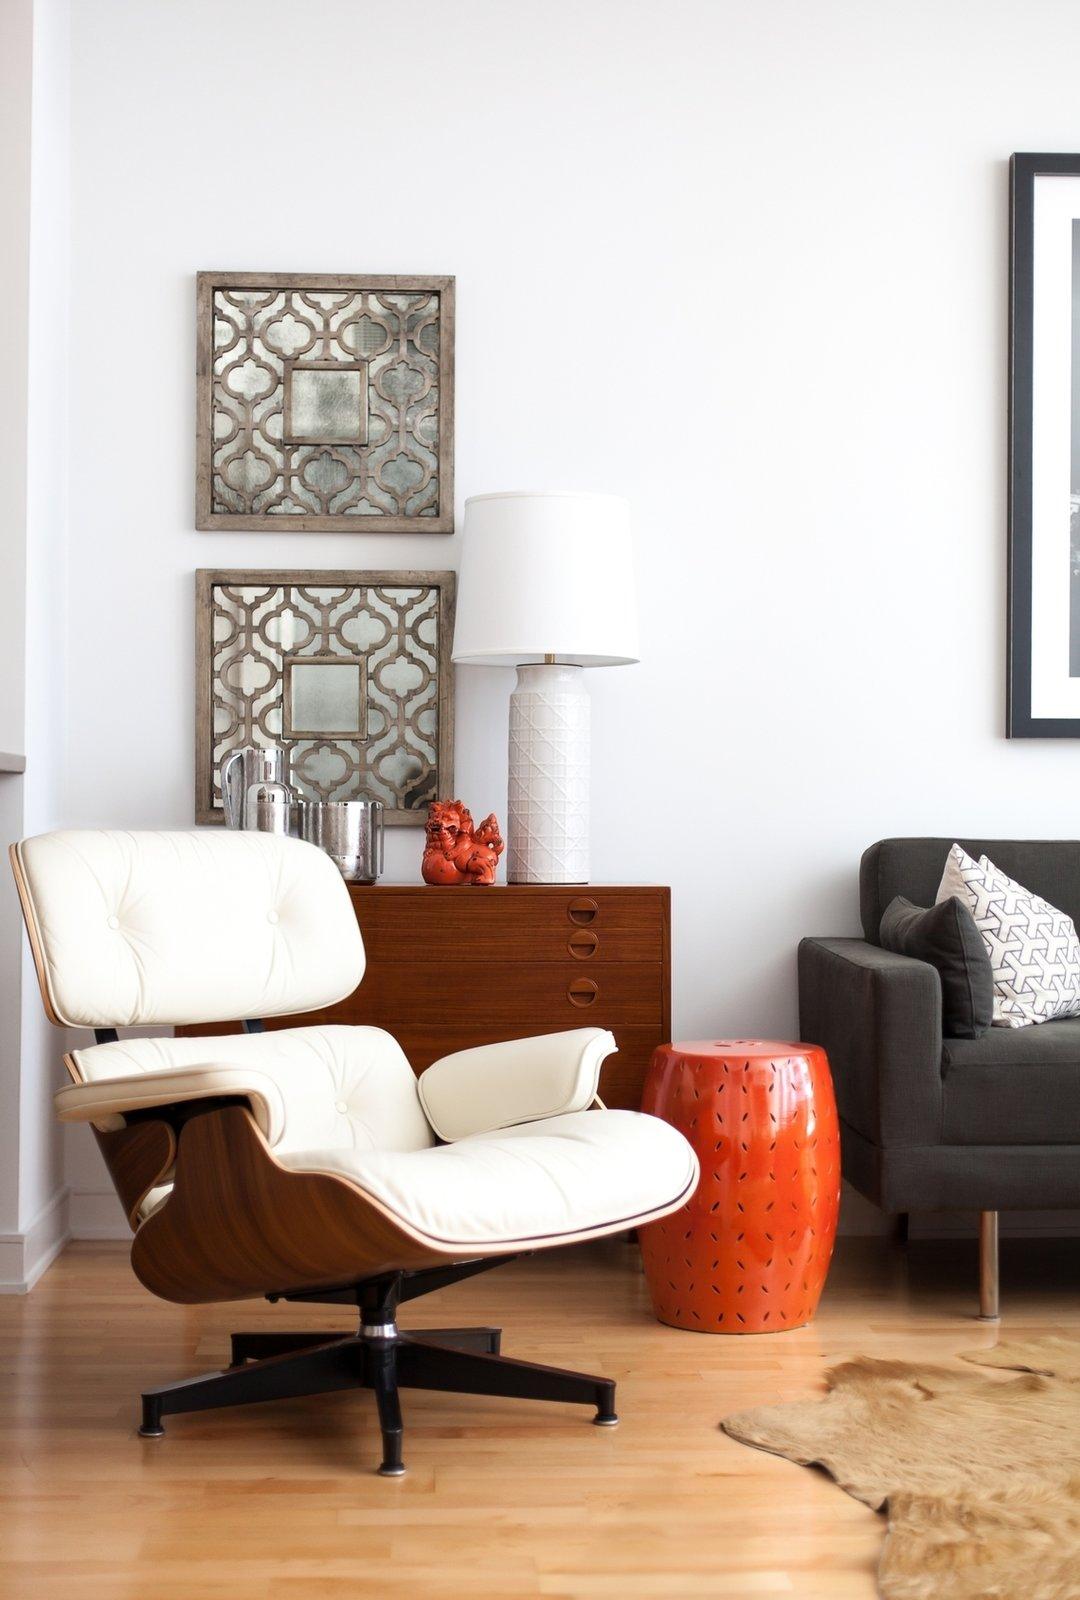 Chair, Floor Lighting, Sofa, End Tables, Coffee Tables, Medium Hardwood Floor, and Living Room Living  Tower Condo